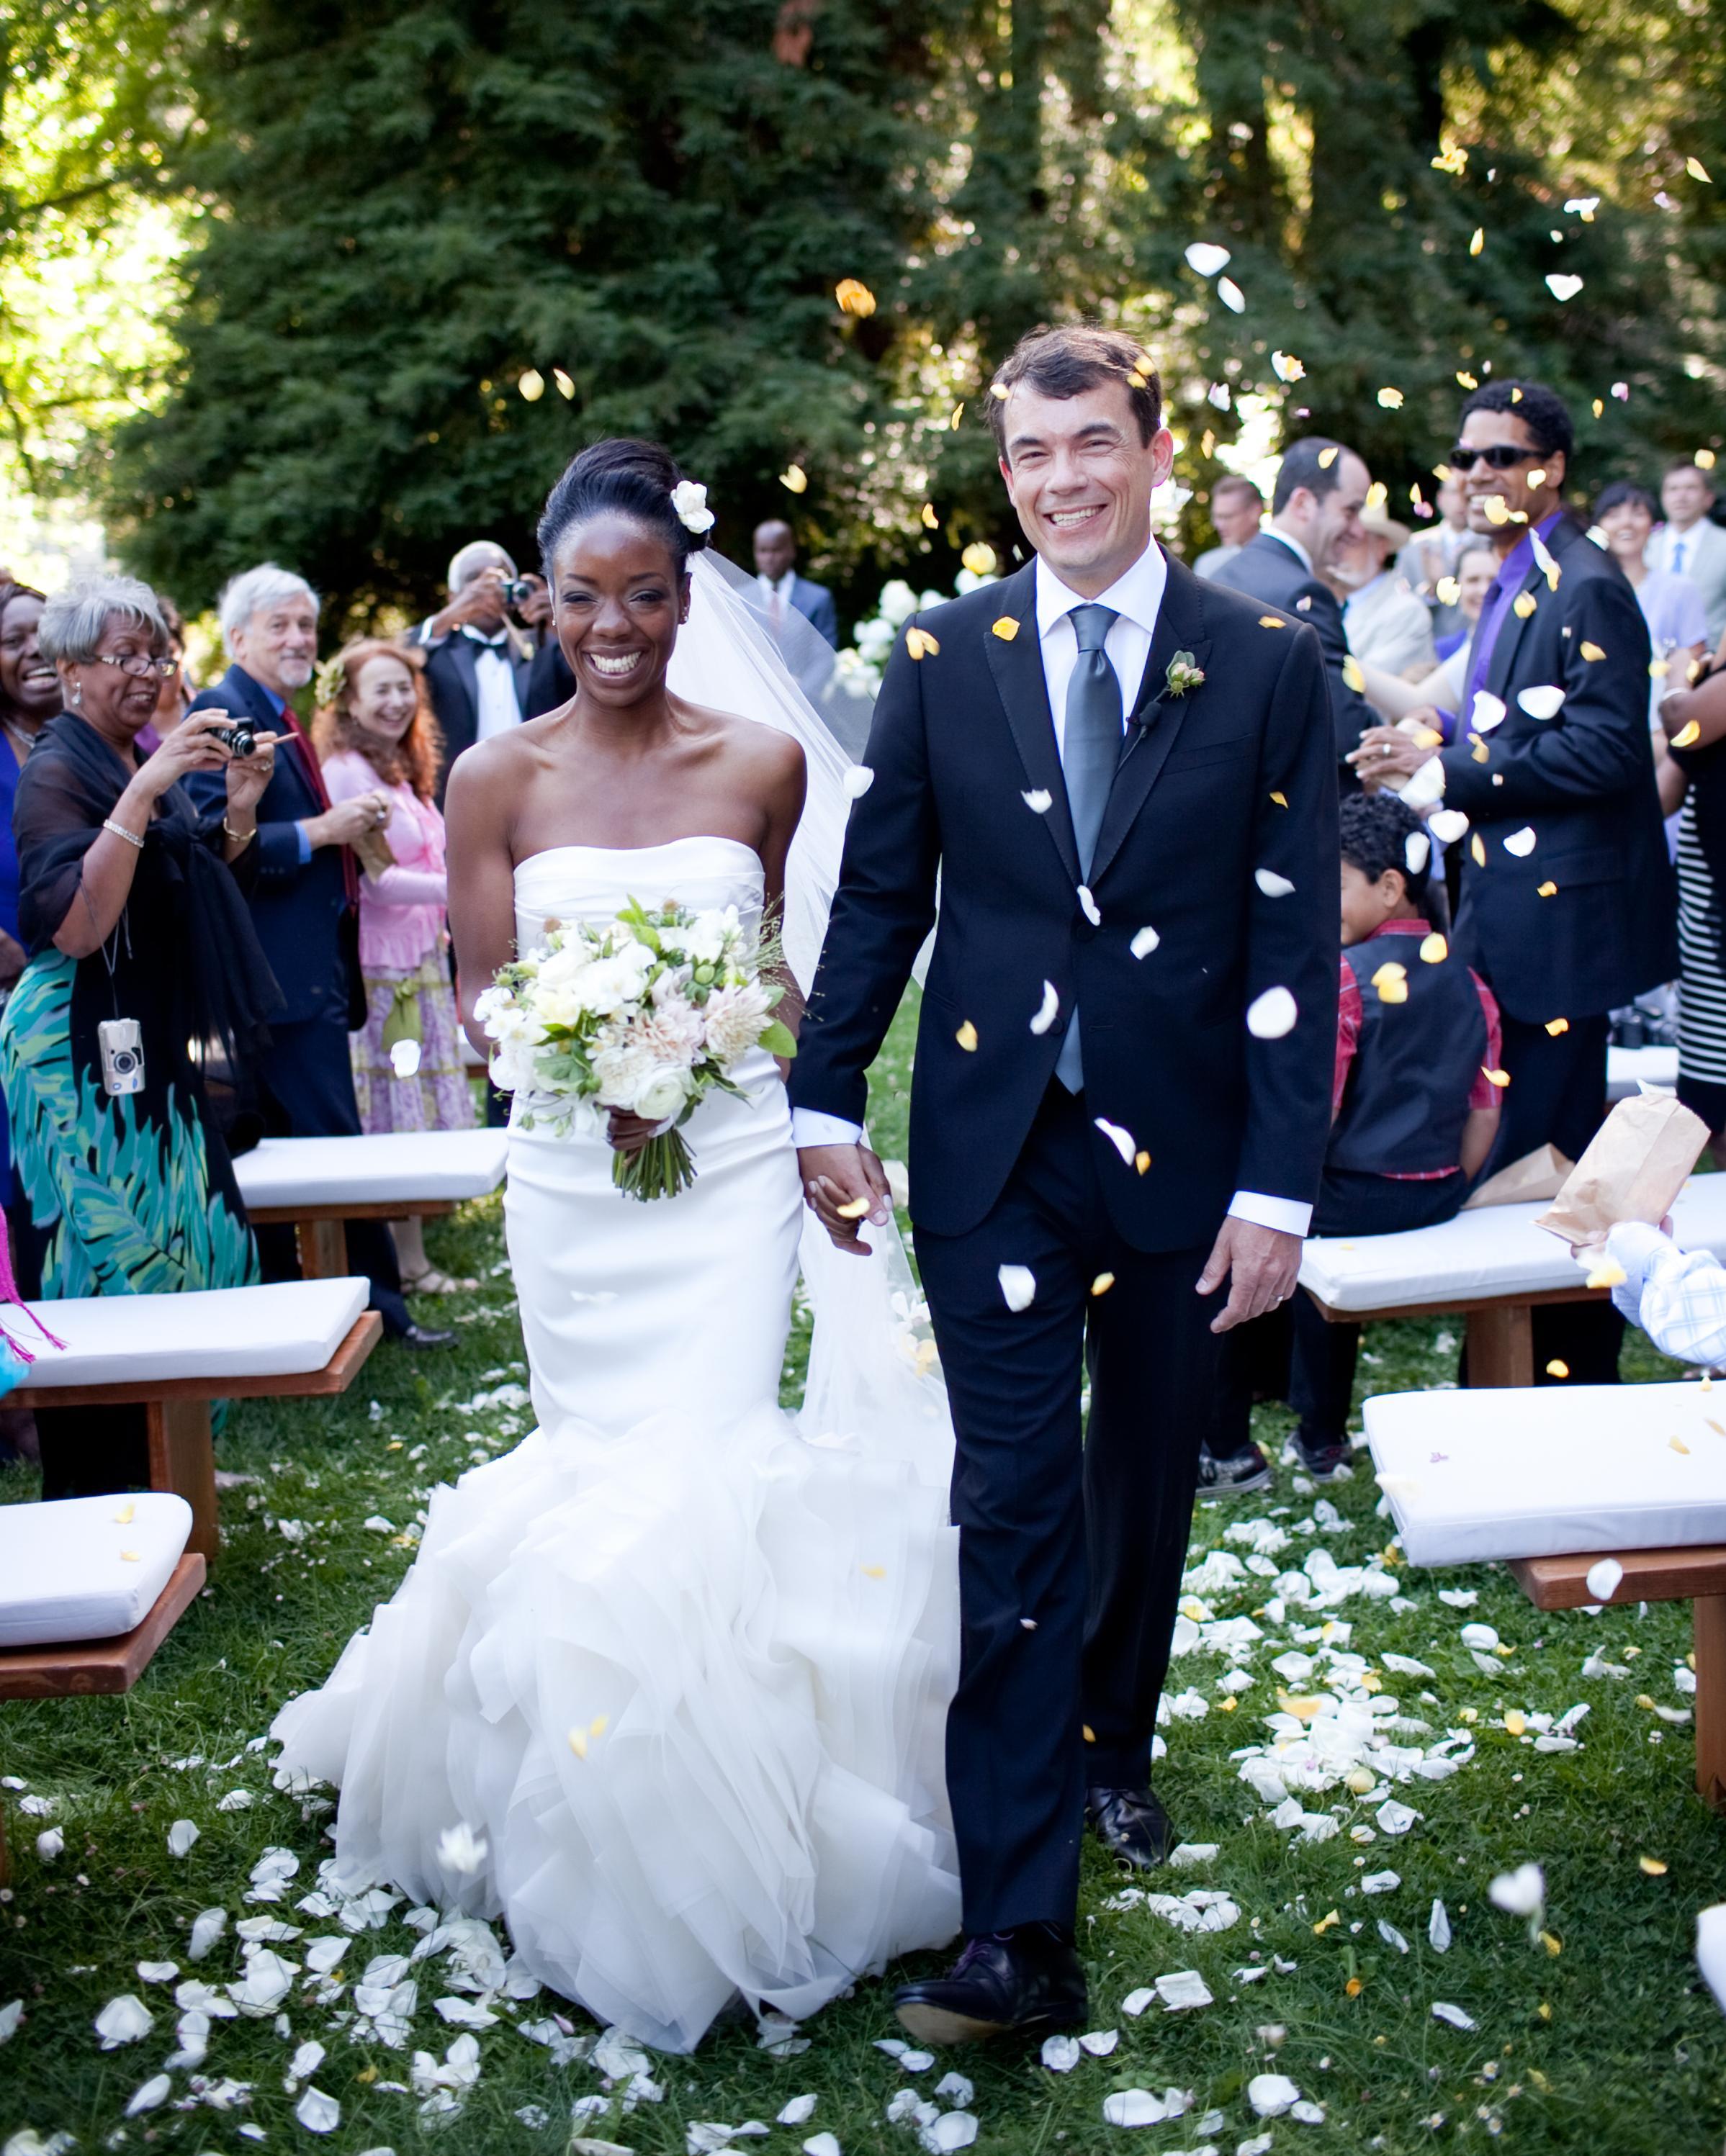 couple-wedding-aisle-0615